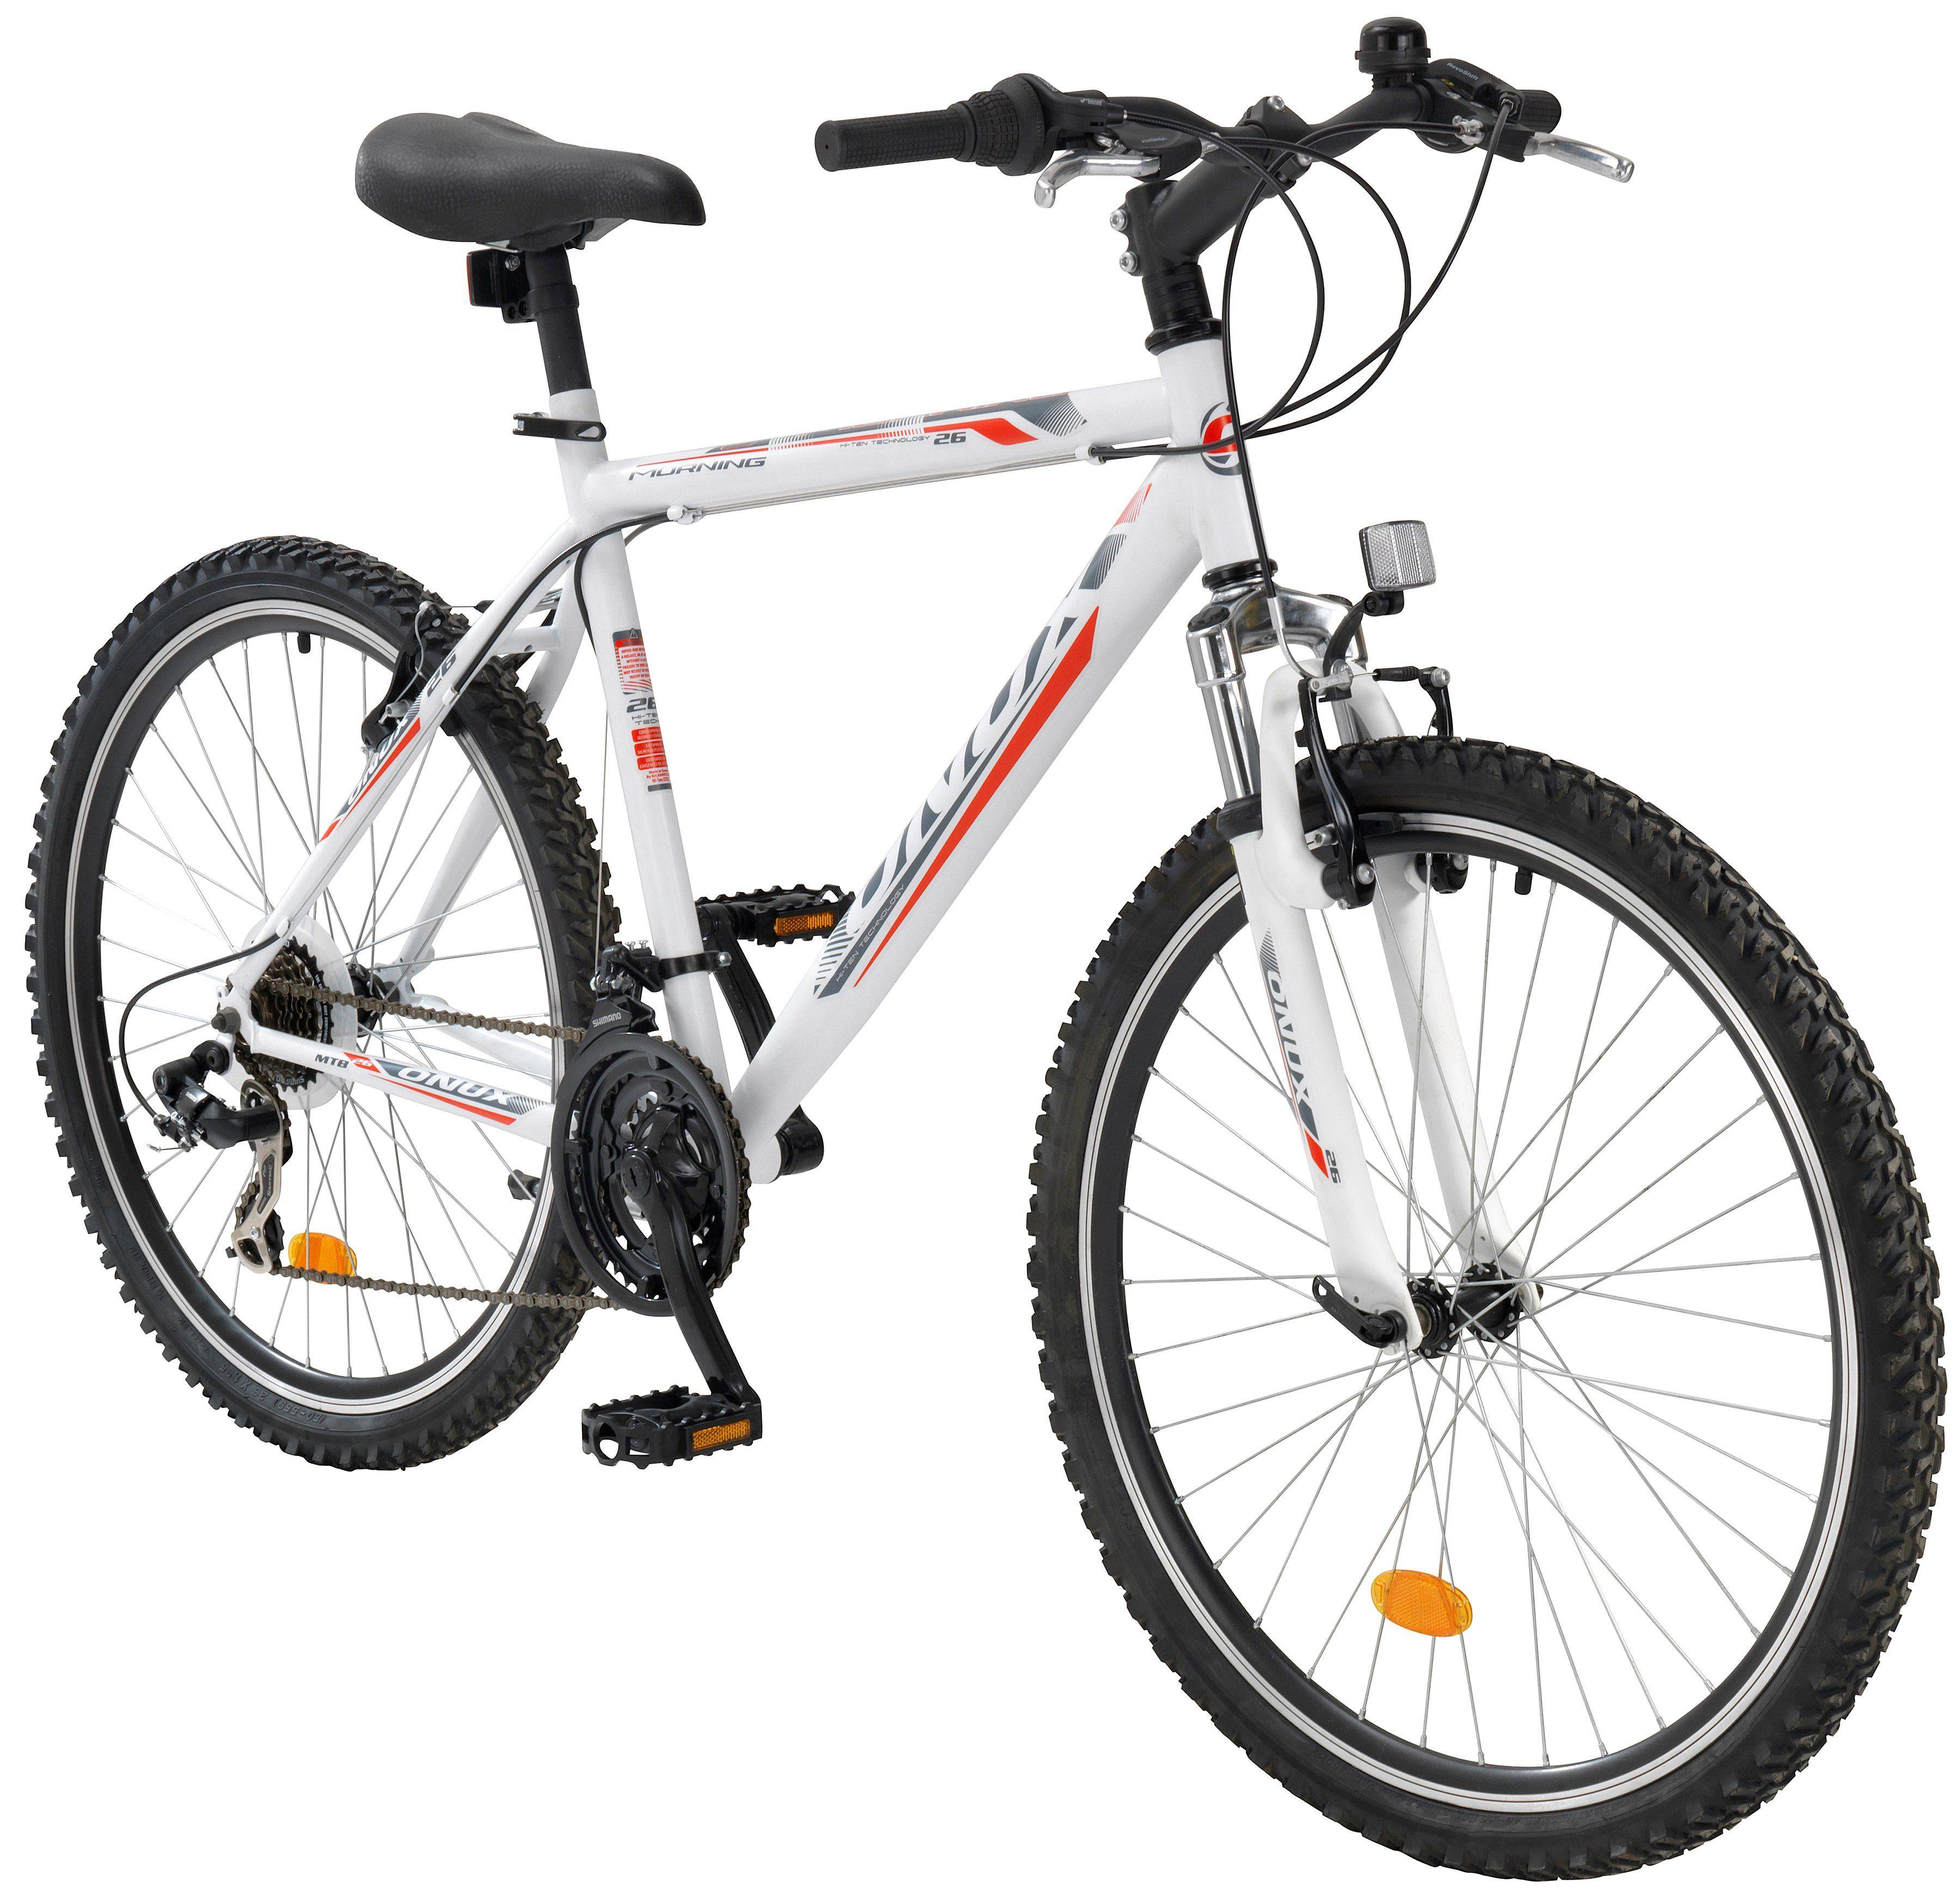 ONUX Mountainbike »Morning«, 28 Zoll, 21 Gang, V-Bremsen